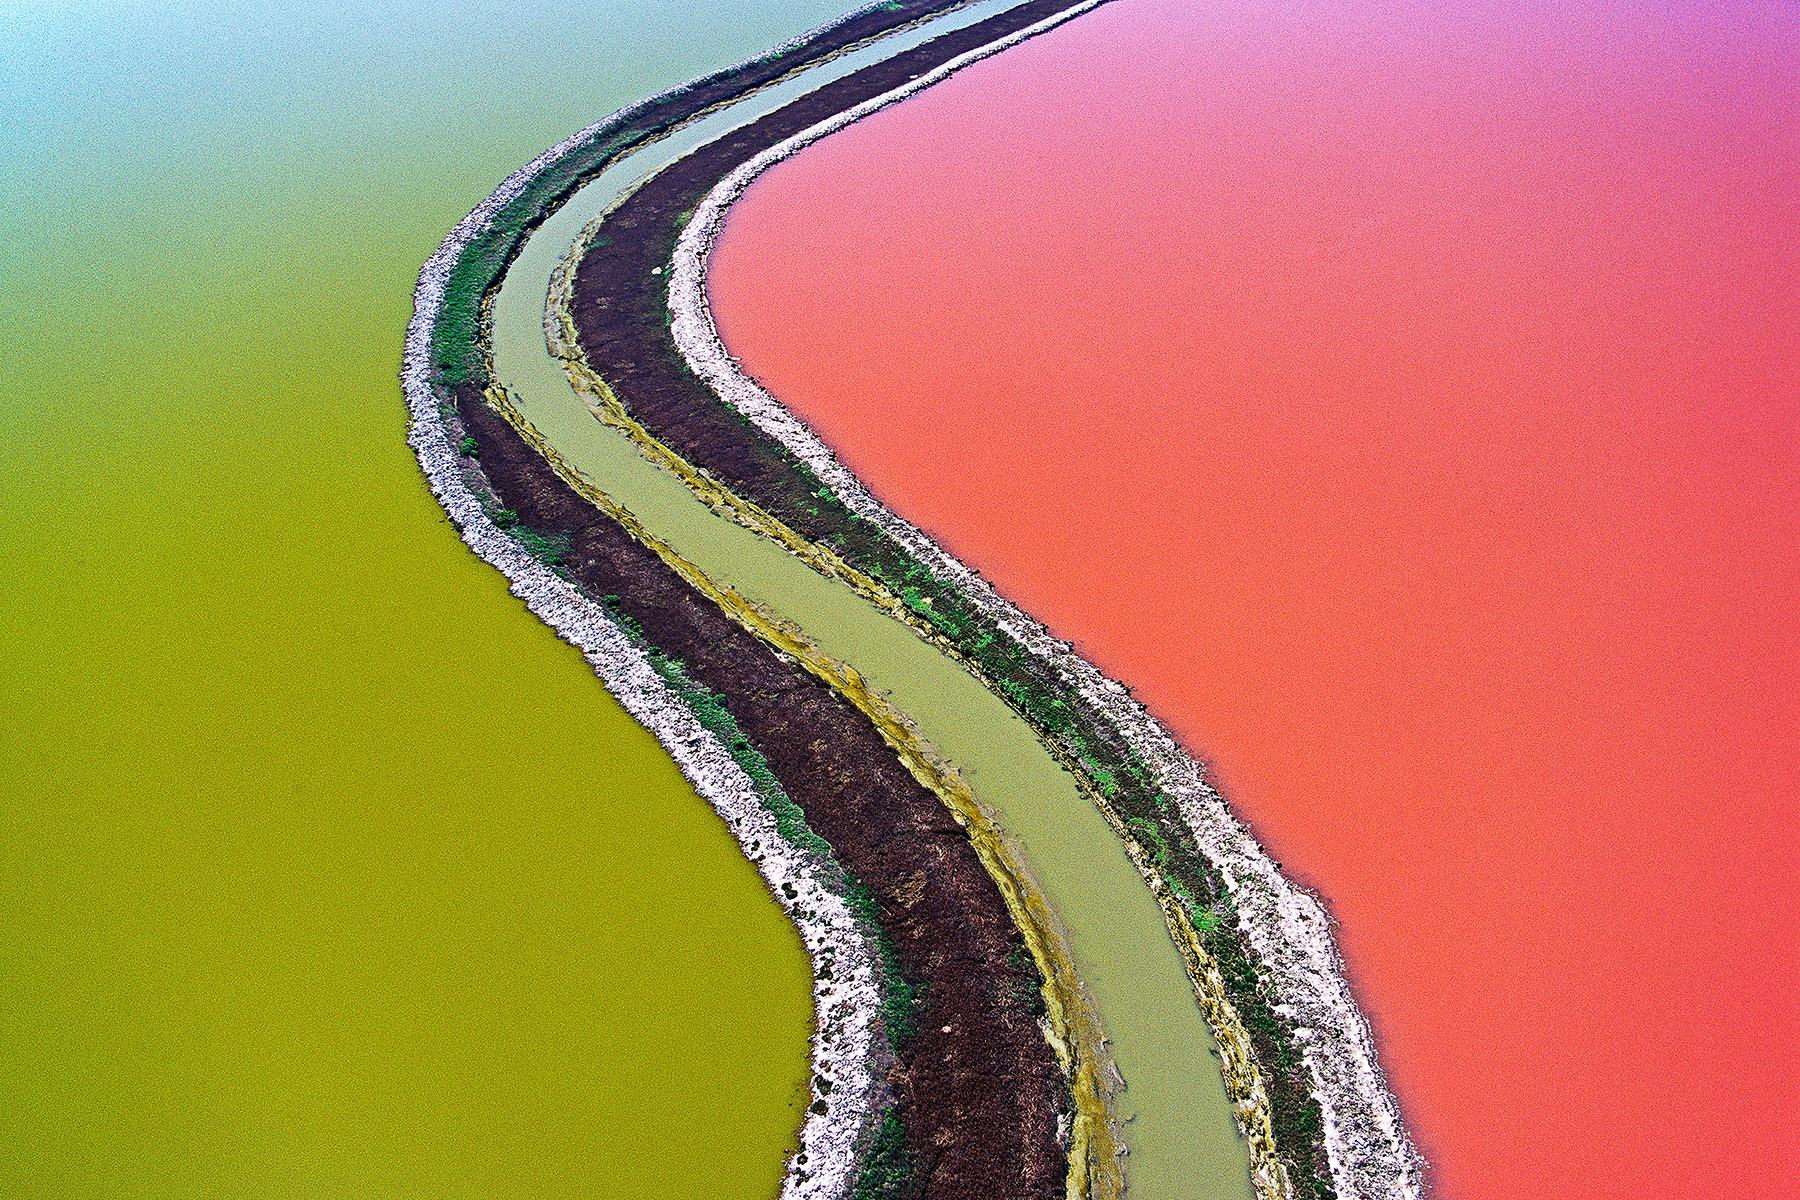 Colin_McRae_SF Bay Salt Ponds_Red Green S_4.jpg